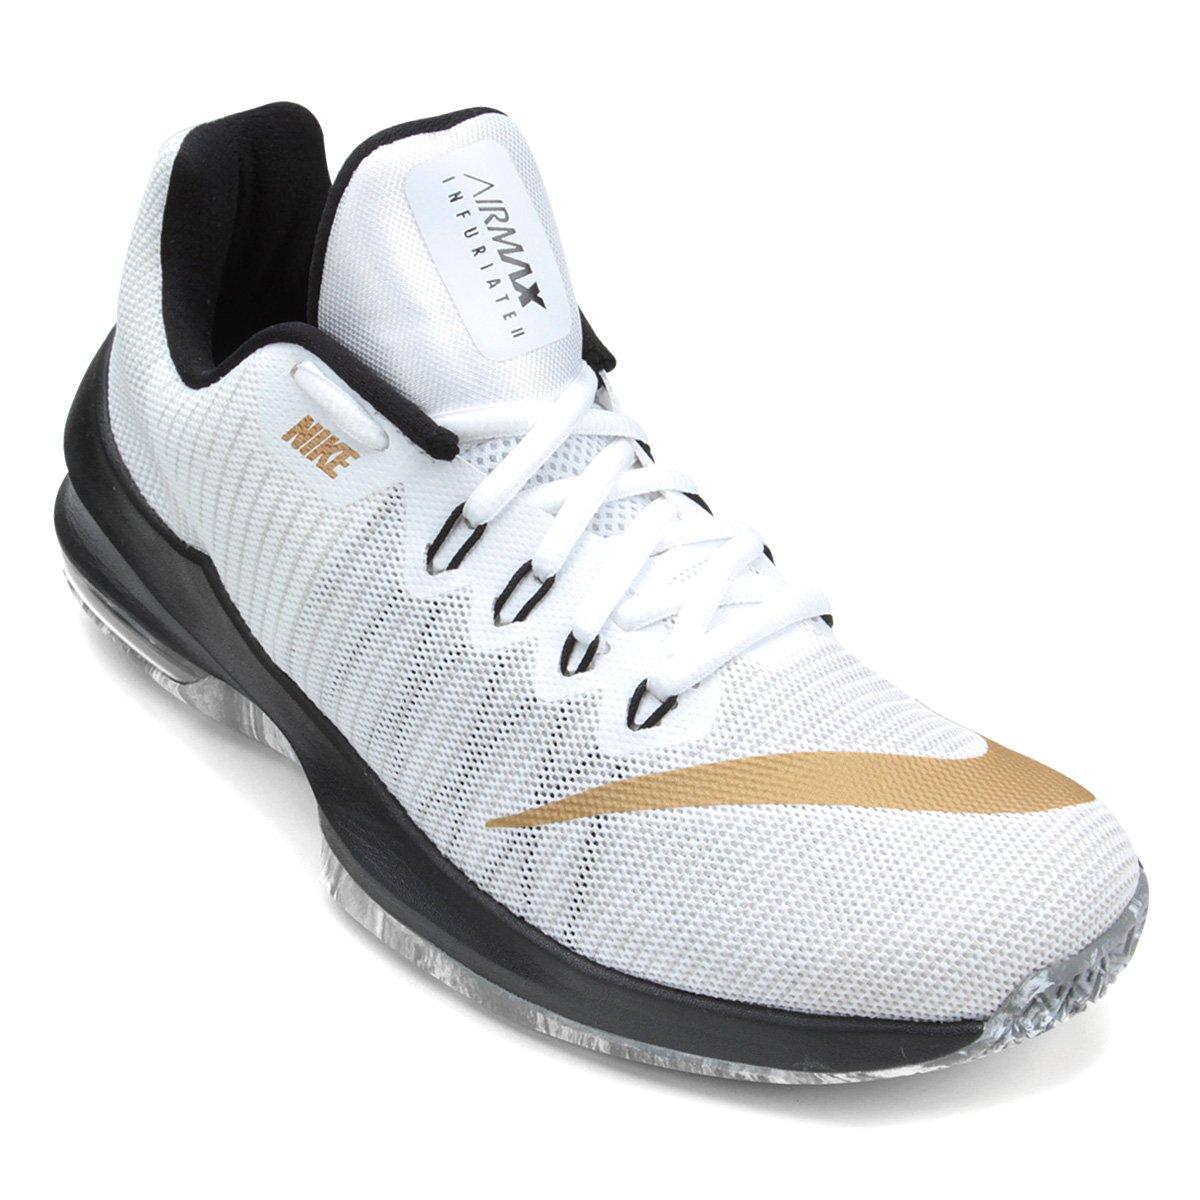 T 234 Nis Nike Air Max Infuriate 2 Low Masculino Netshoes